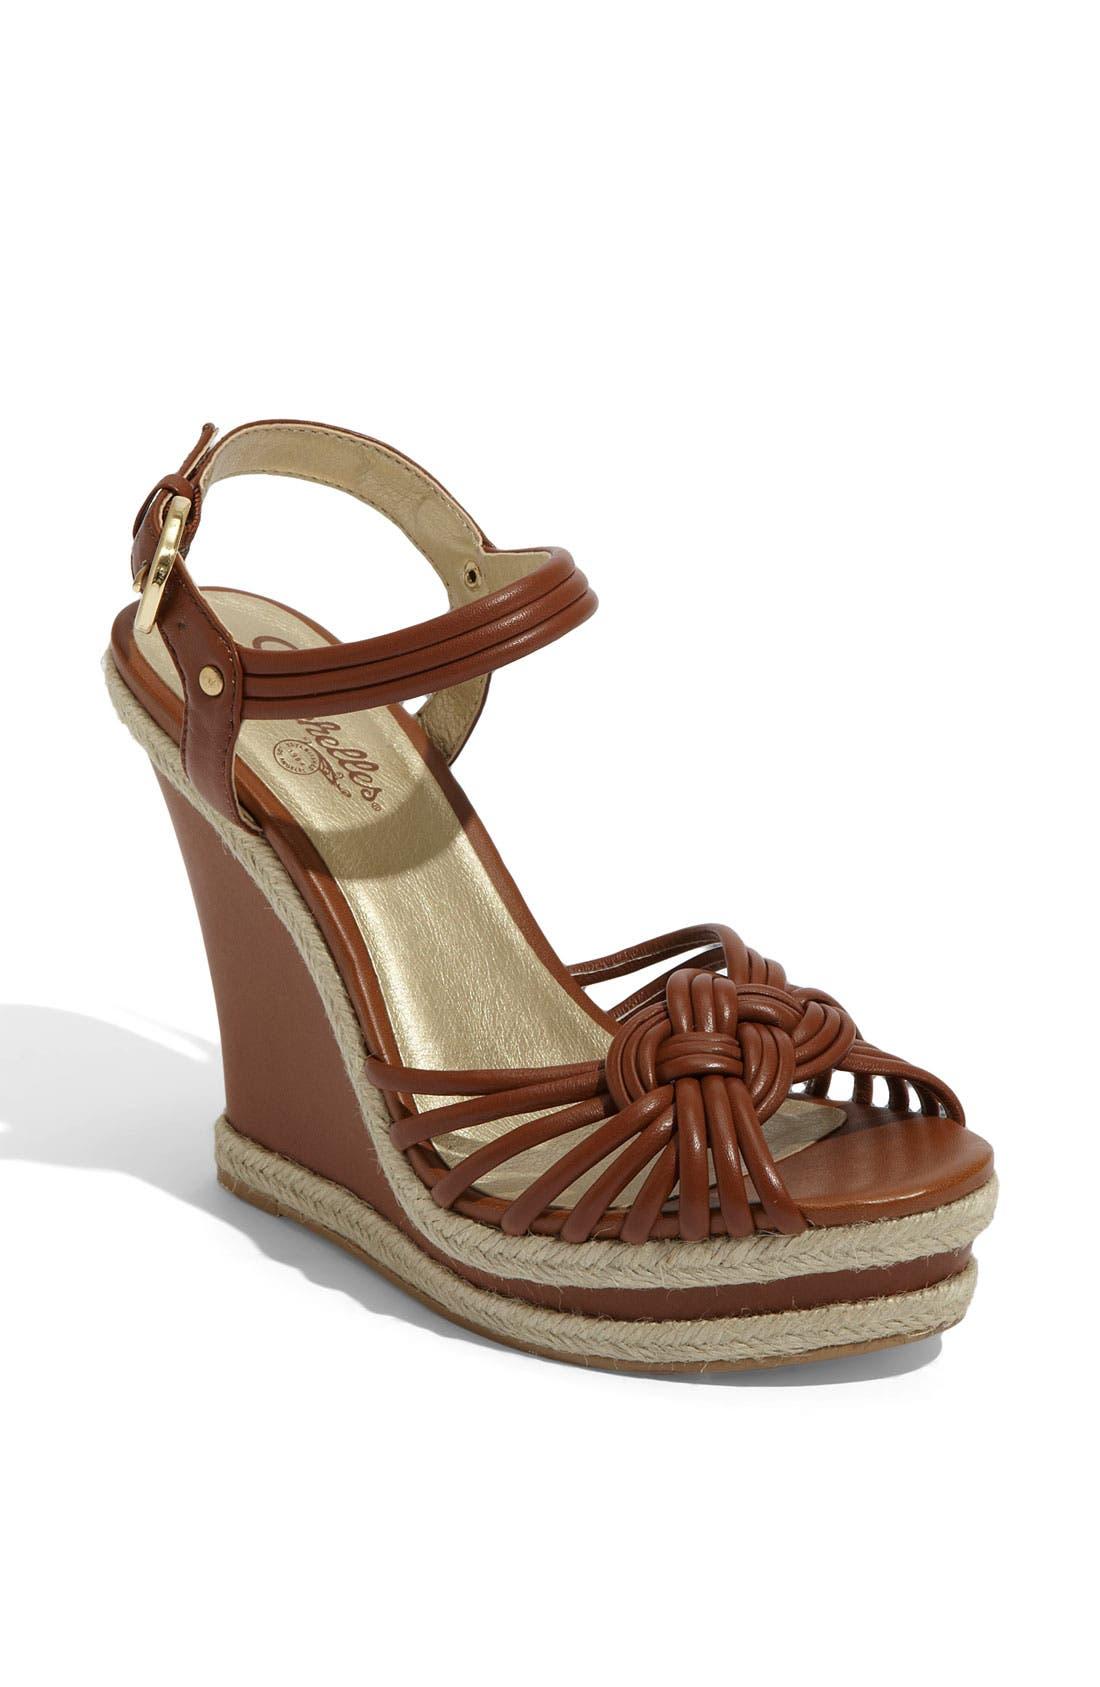 Main Image - Seychelles 'Harlow' Espadrille Sandal